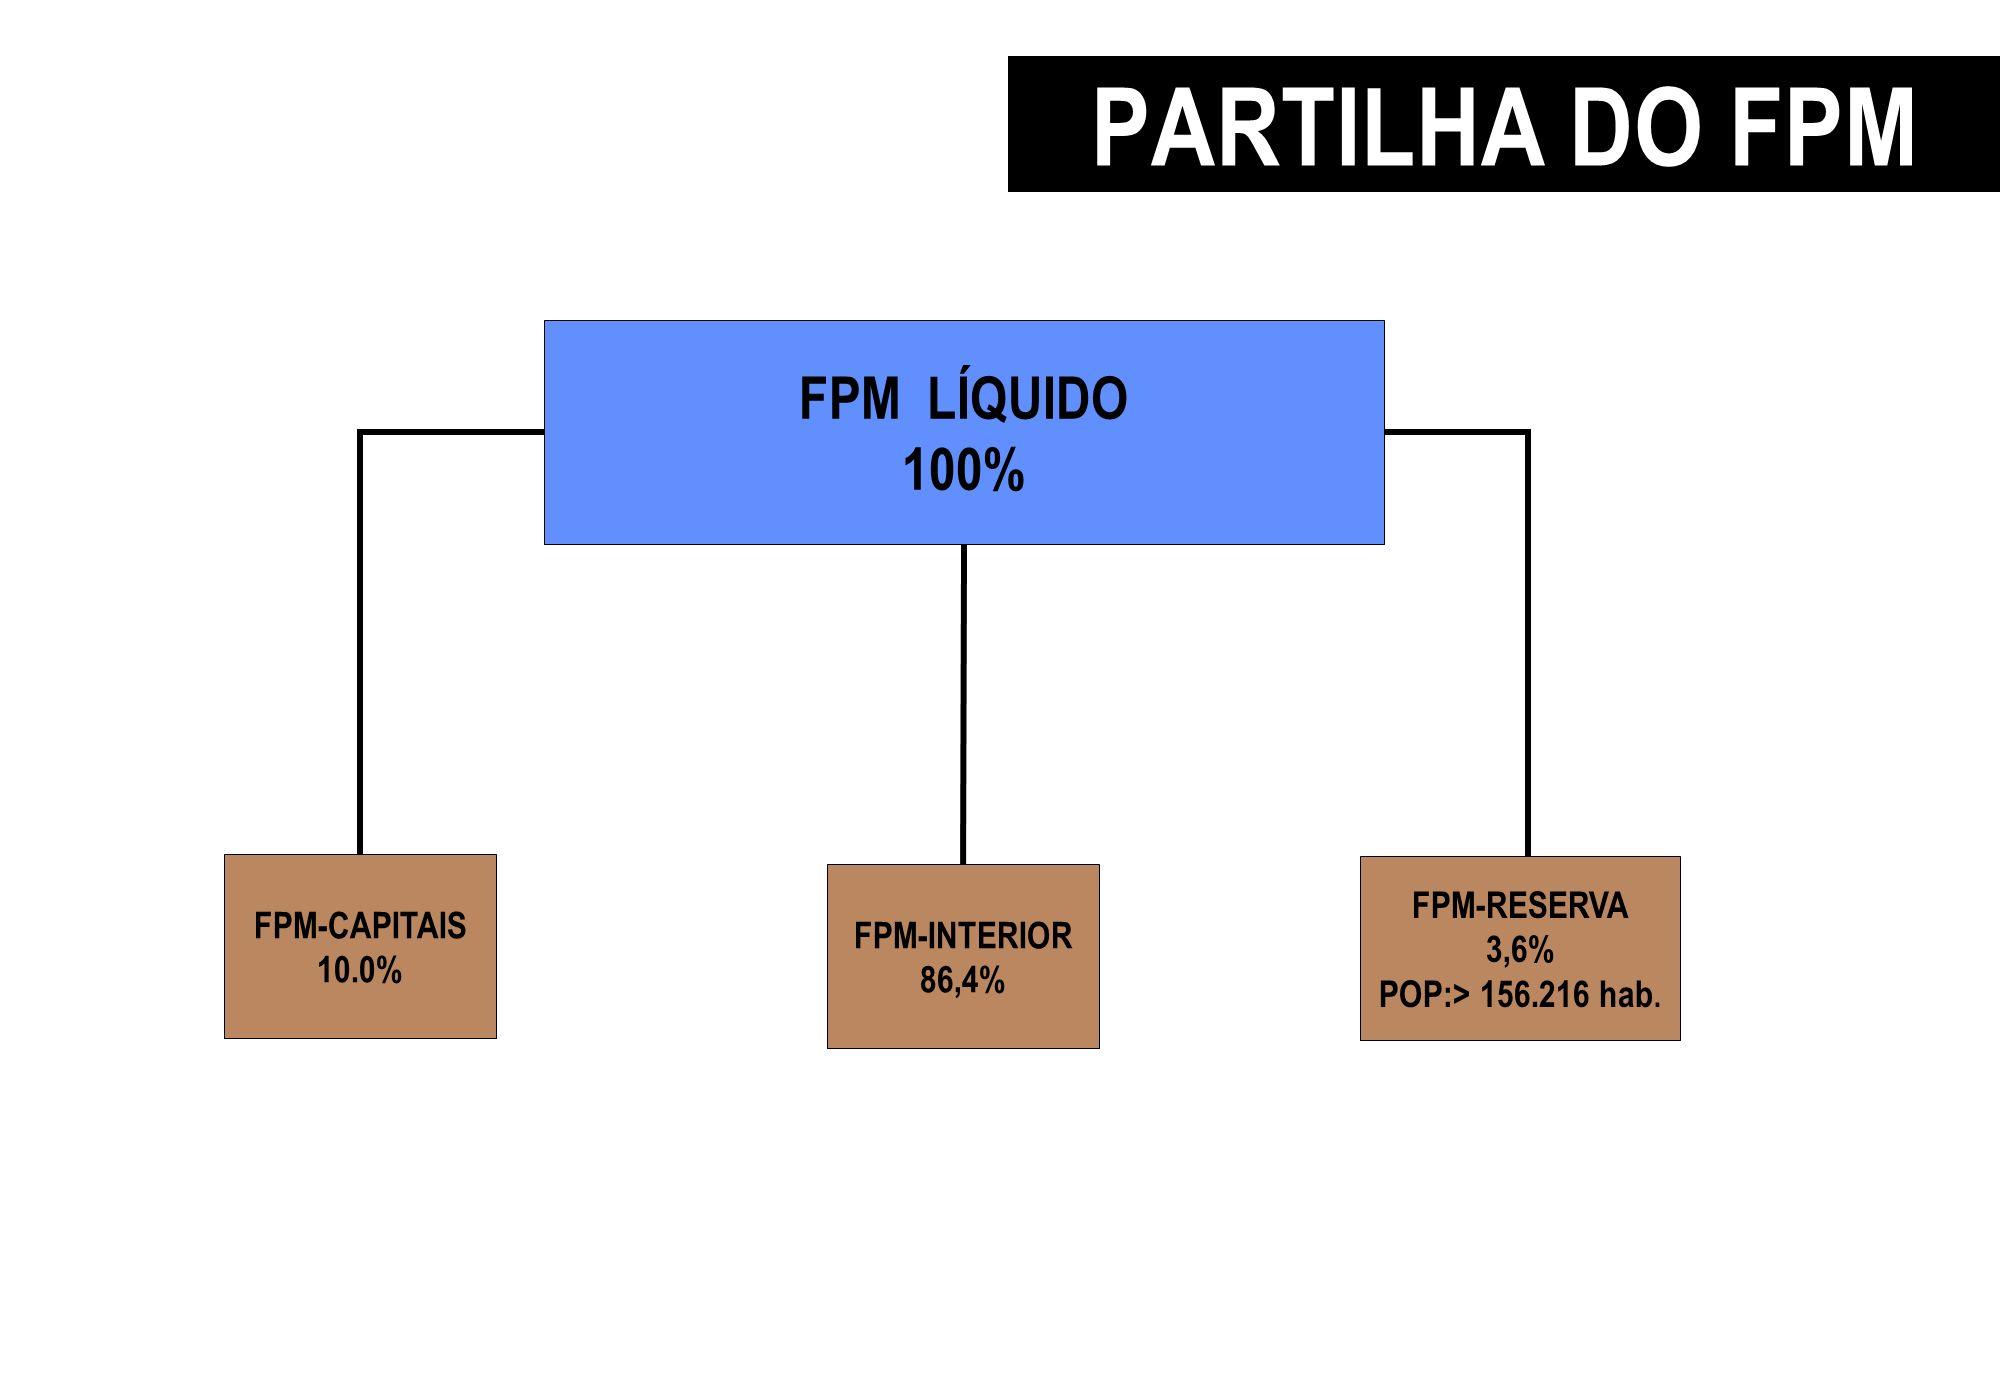 PARTILHA DO FPM 10% p/CAPITAIS FPM LÍQUIDO 100% FPM-INTERIOR 86,4% FPM-RESERVA 3,6% POP:> 156.216 hab. FPM-CAPITAIS 10.0%